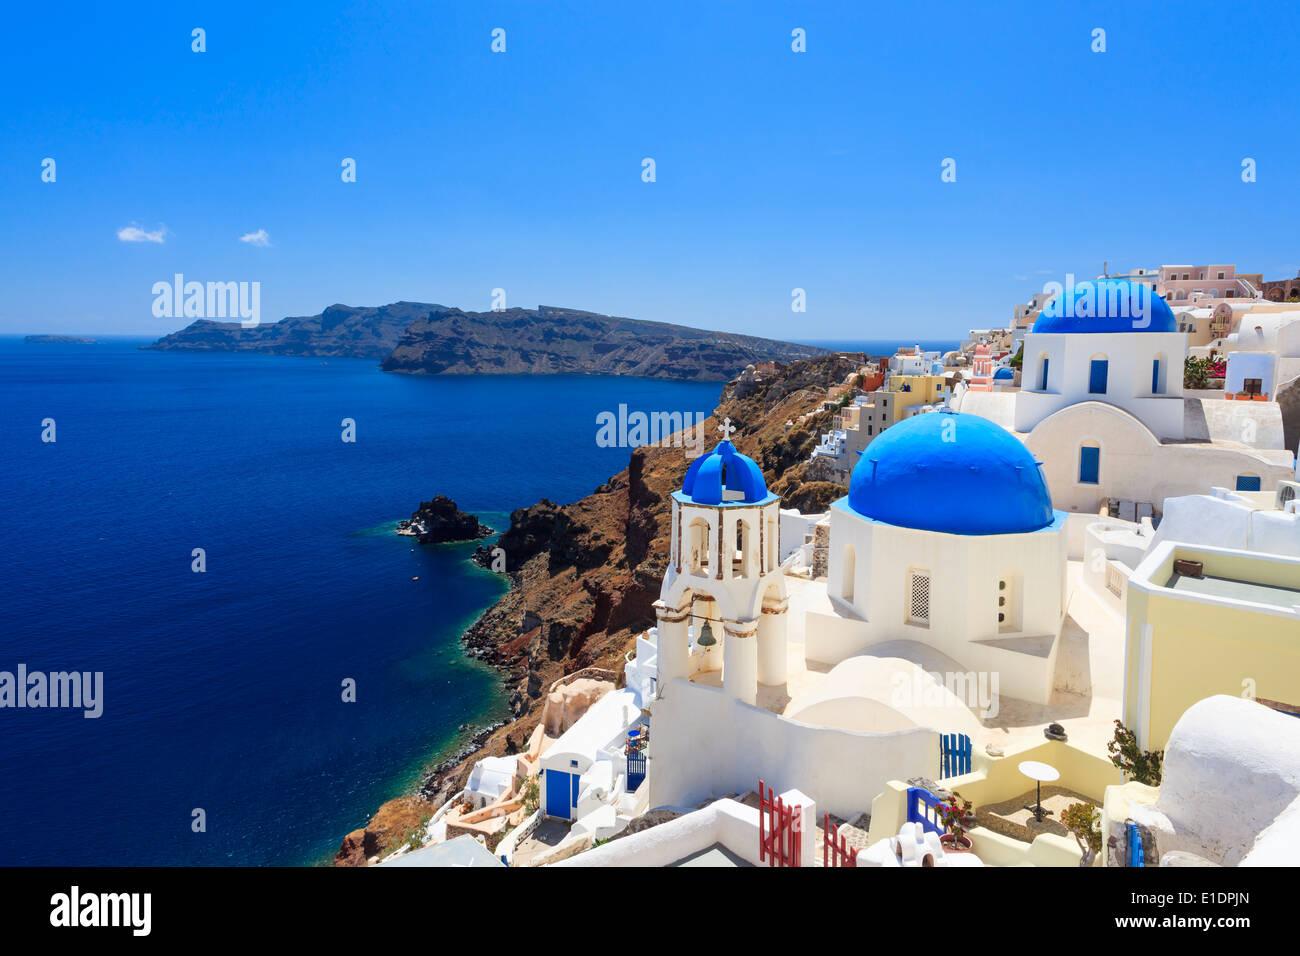 Iglesias con cúpula azul en la Caldera en Oia en la isla griega de Santorini. Imagen De Stock